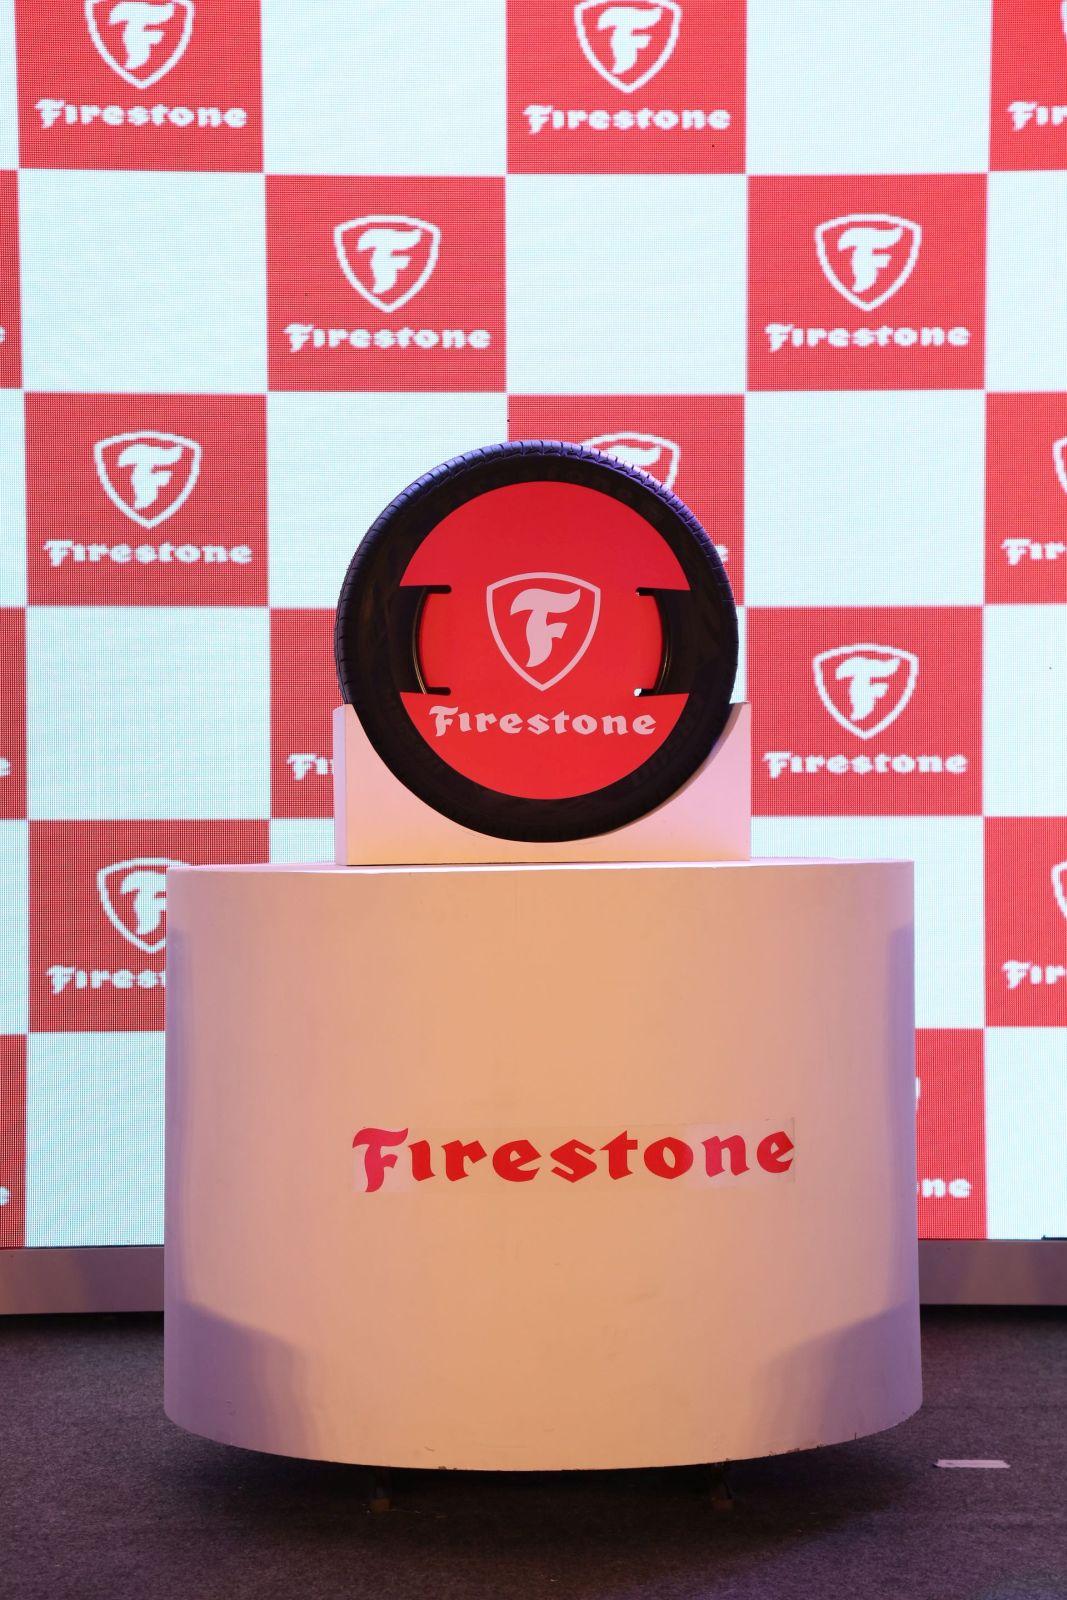 Bridgestone introduces the Firestone brand (2)